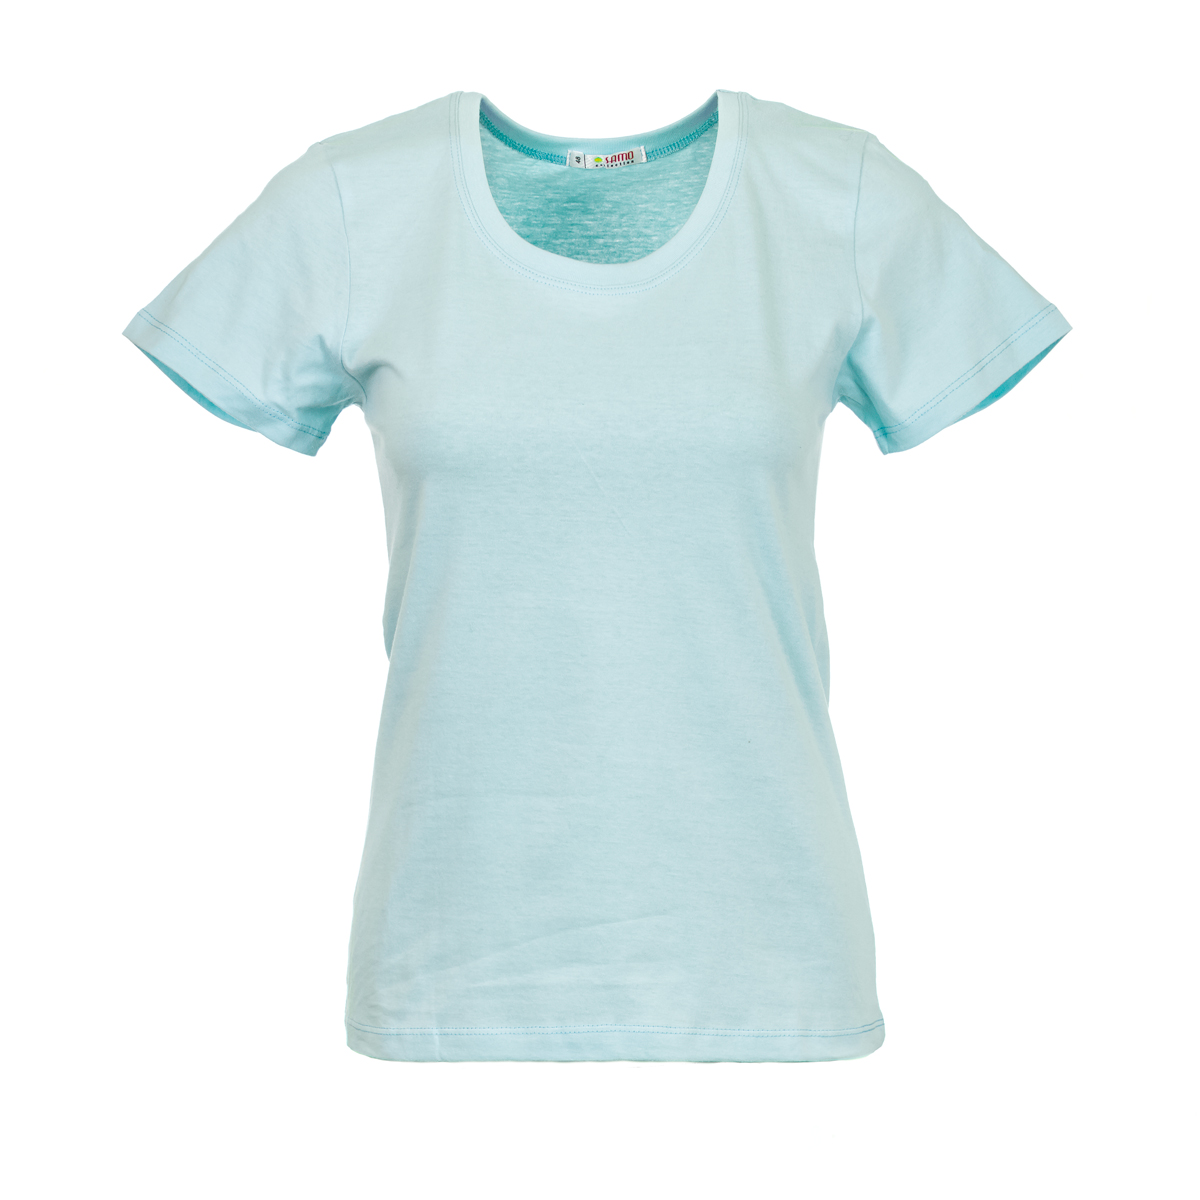 Жен. футболка арт. 04-0045 Розовый р. 52Майки и футболки<br>Фактический ОГ:90 см<br>Фактический ОТ:88 см<br>Фактический ОБ:98 см<br>Длина по спинке:62 см<br>Рост:164-170 см<br><br>Тип: Жен. футболка<br>Размер: 52<br>Материал: Супрем